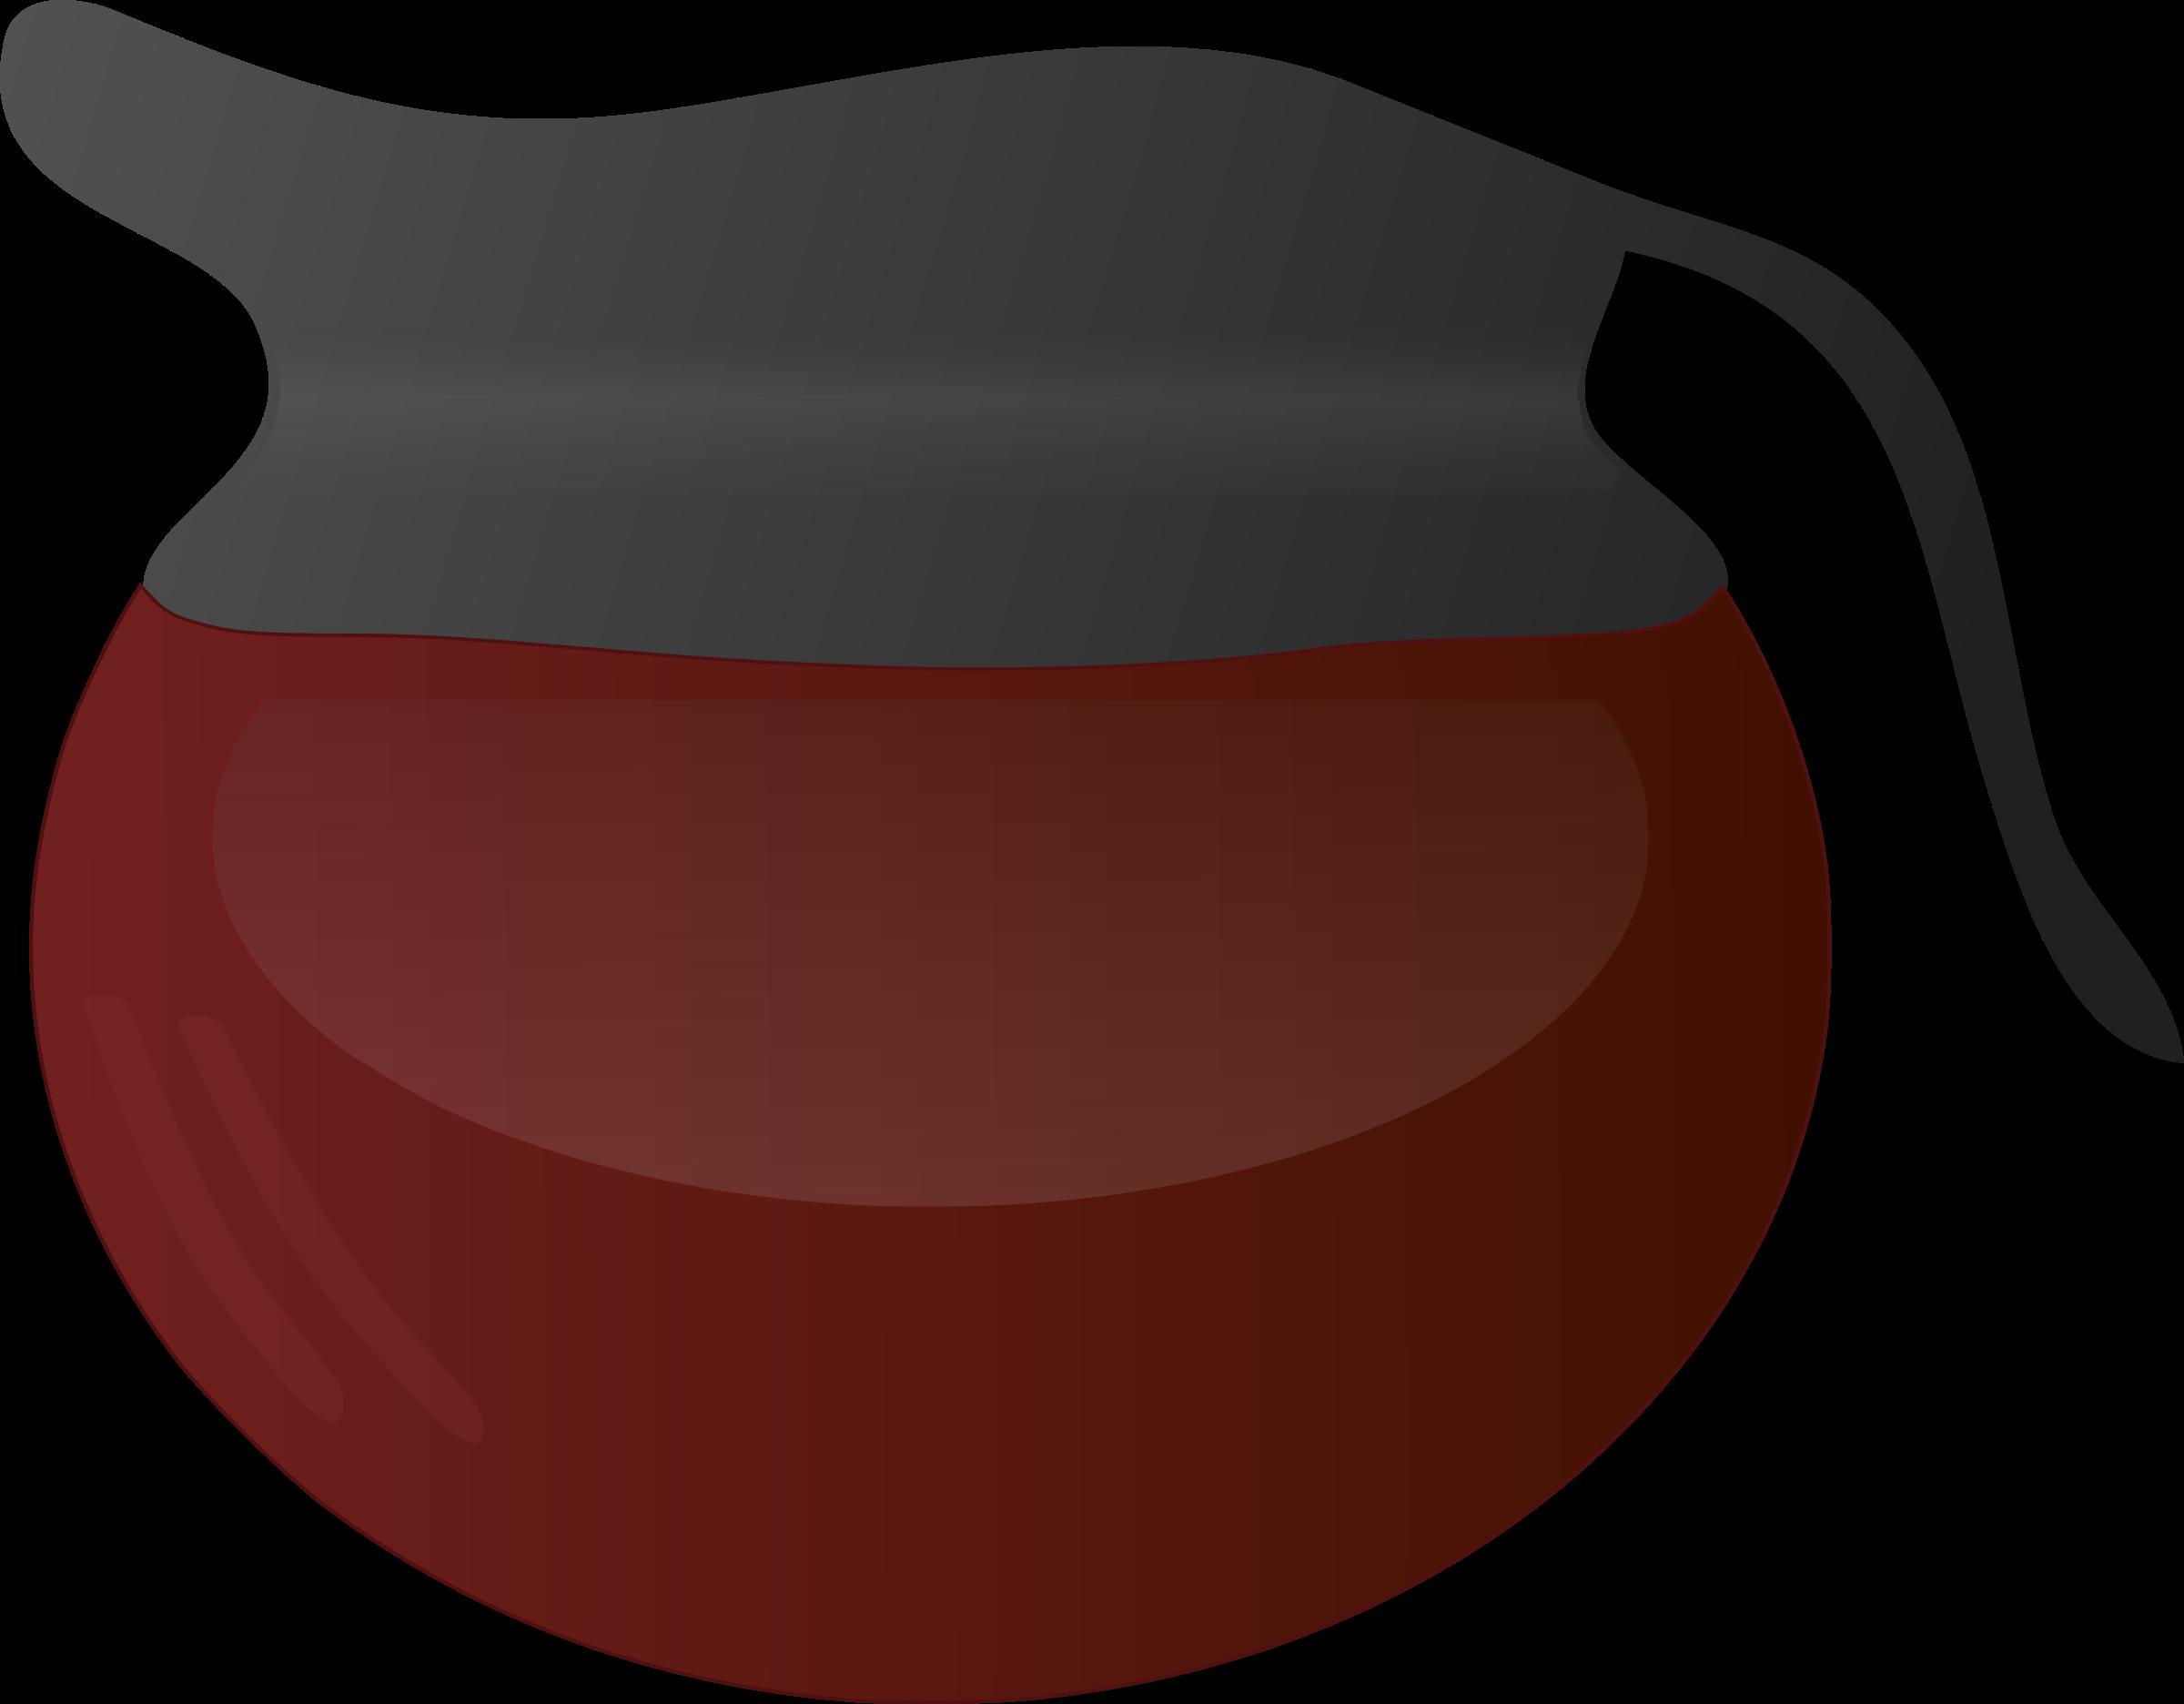 Coffee Pot Clipart Clipart Co - Coffee Pot Clipart